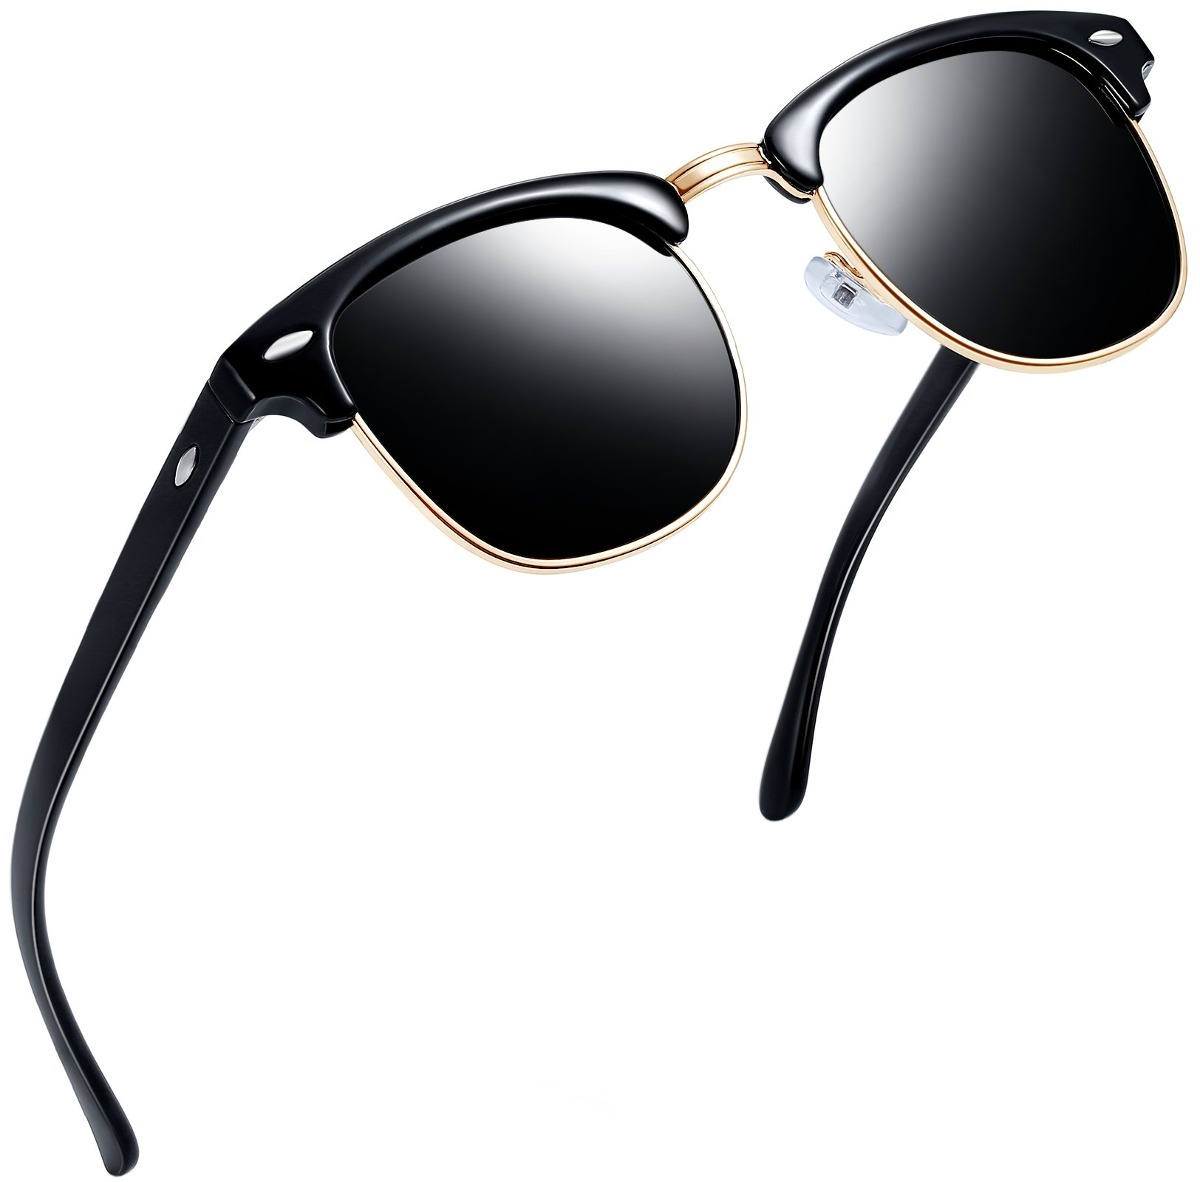 c5fbd50358 Gafas De Sol Retro Marca Joopin Semi Montura Gafas De Sol - U$S 45 ...